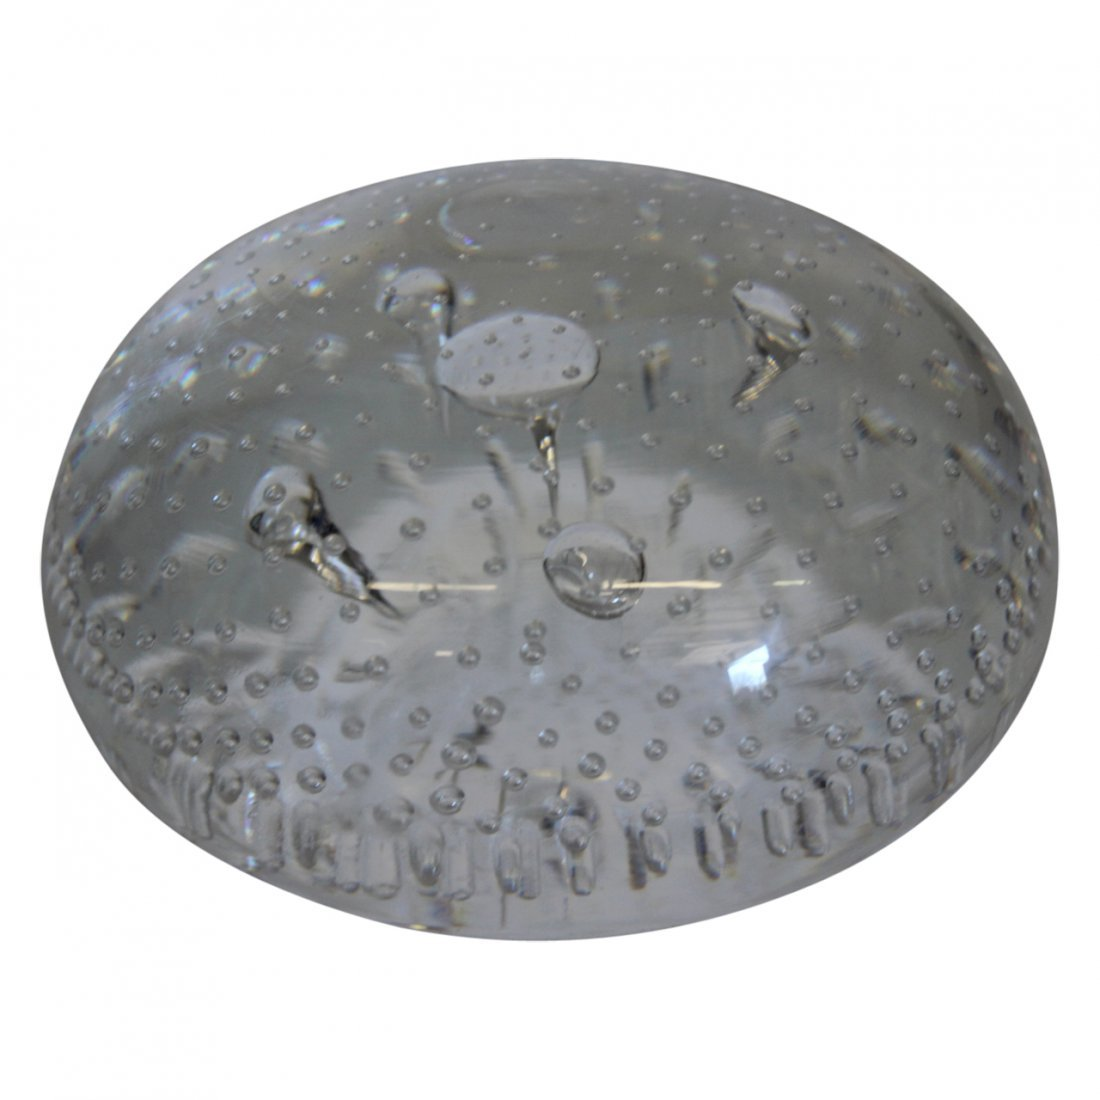 Steuben Art Bubble Glass Object